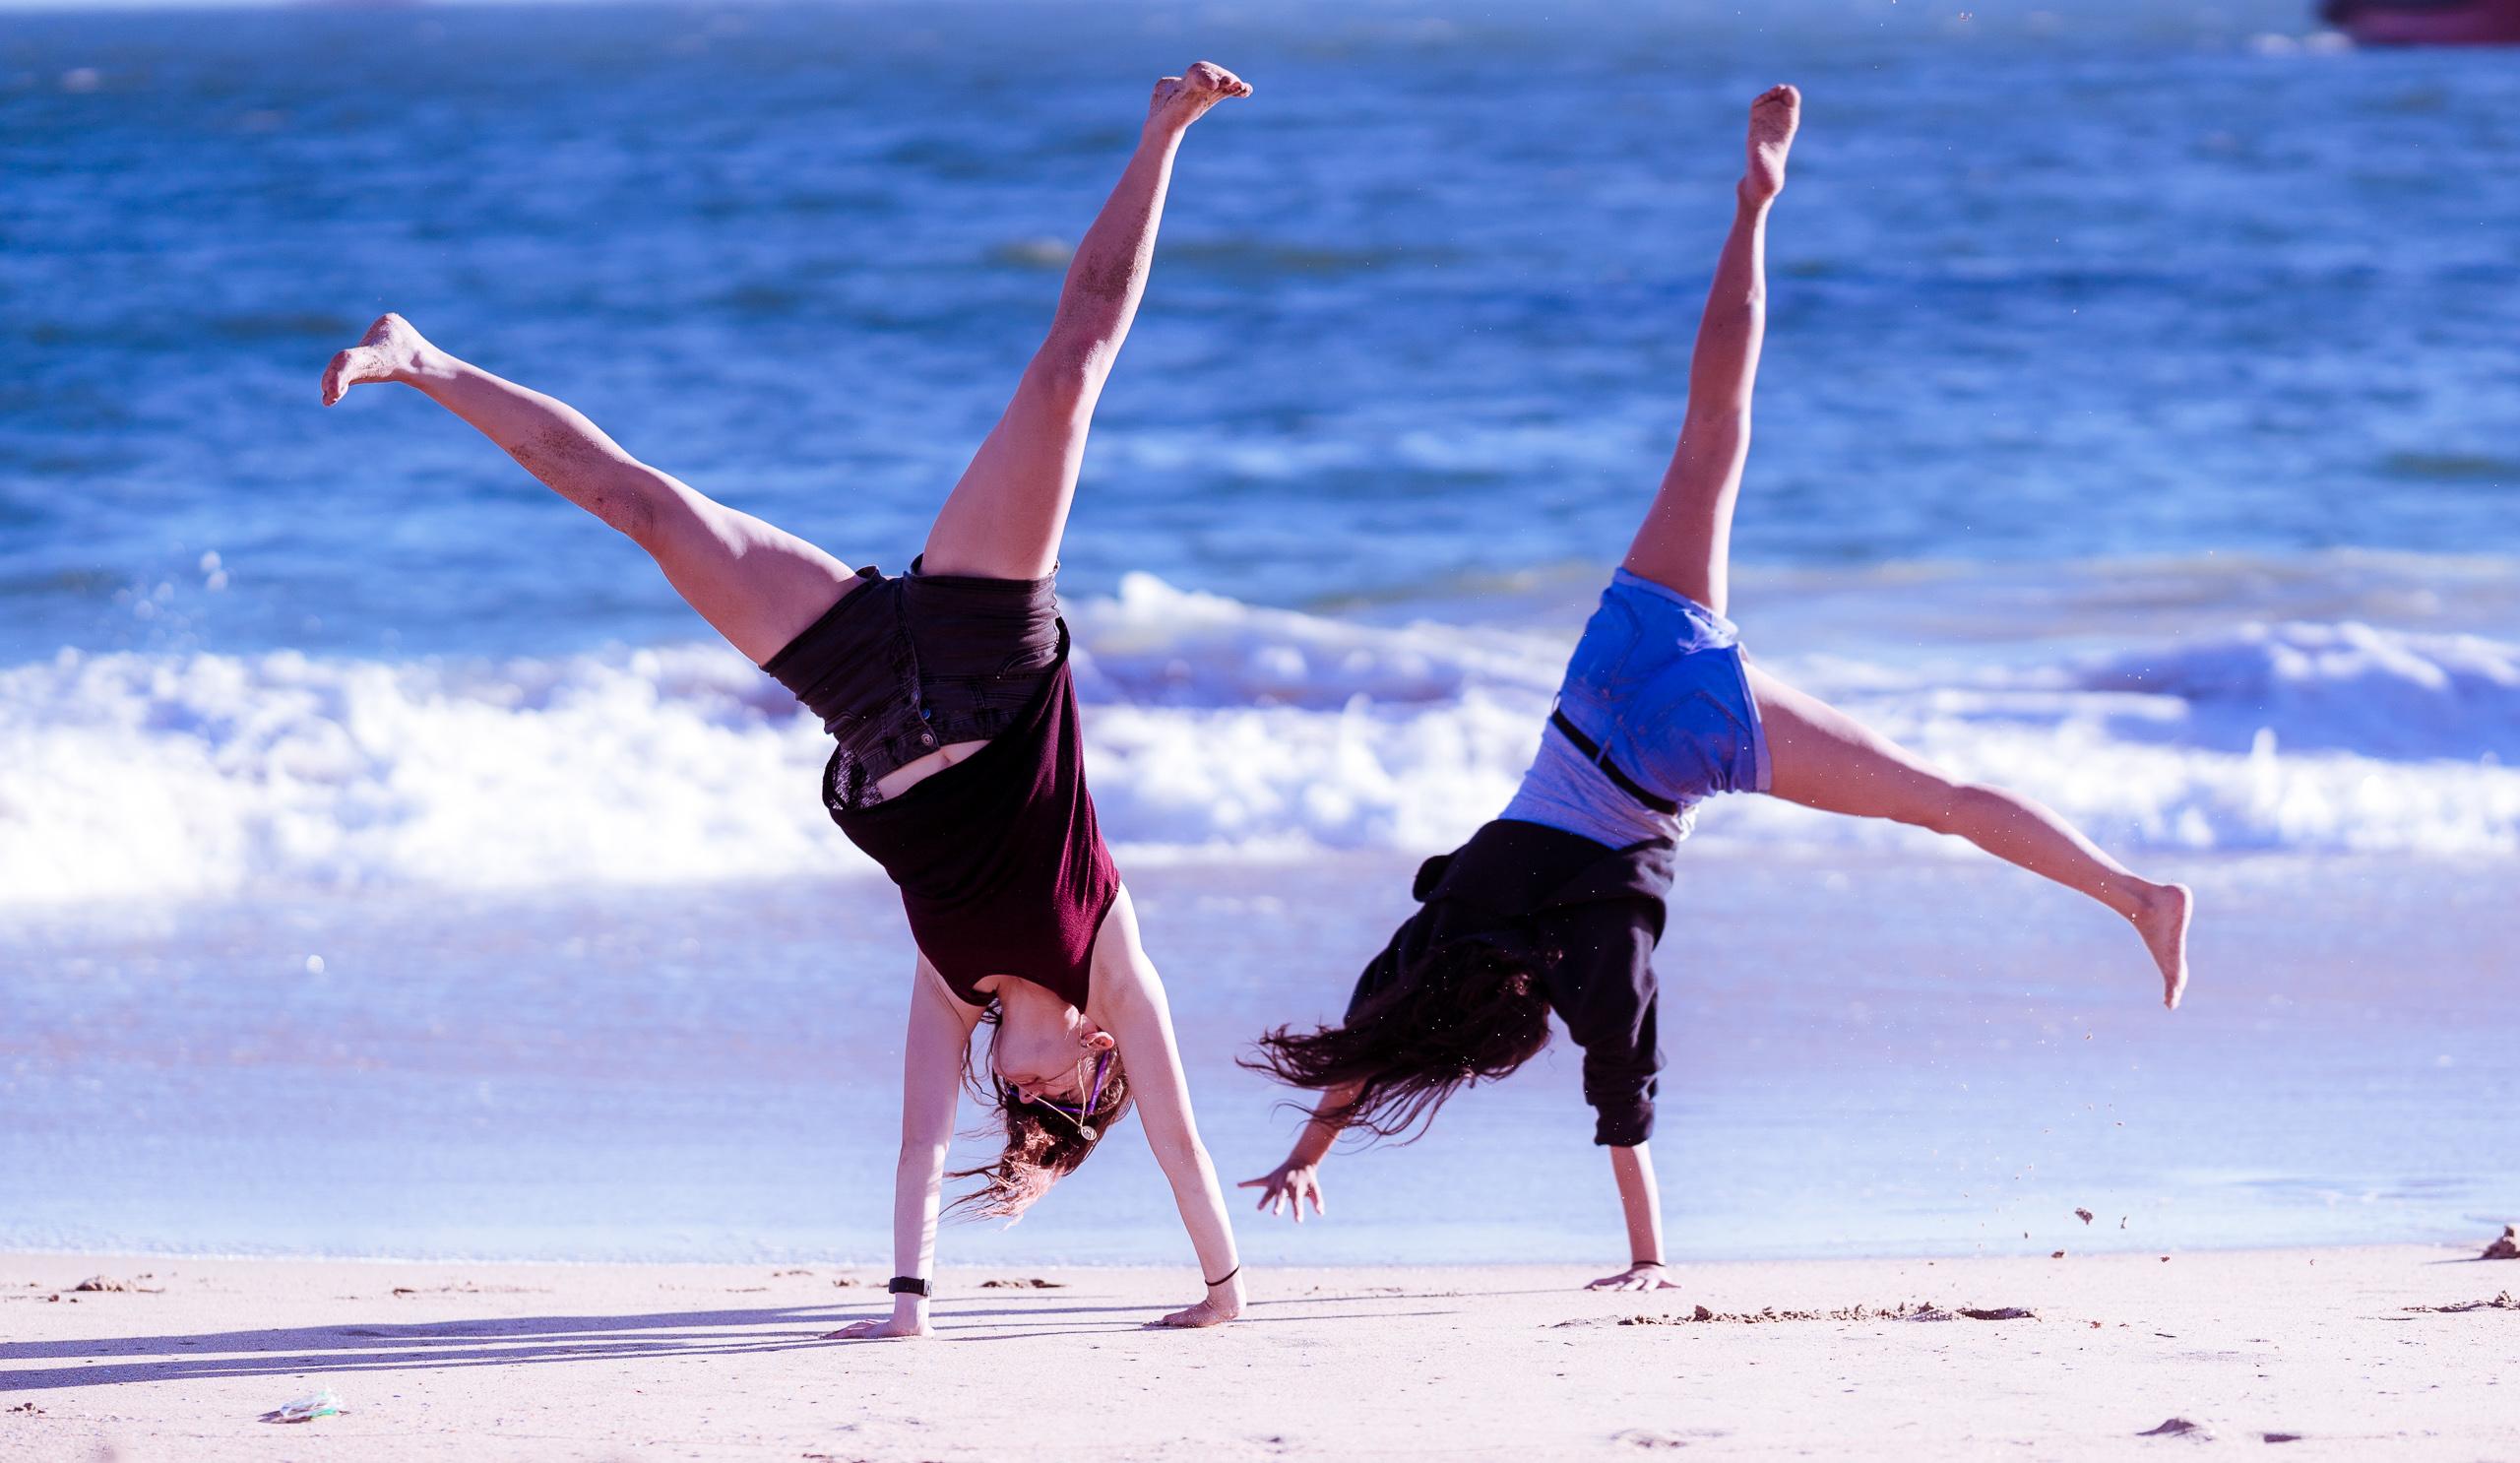 Erica Lander & Audrey Resella